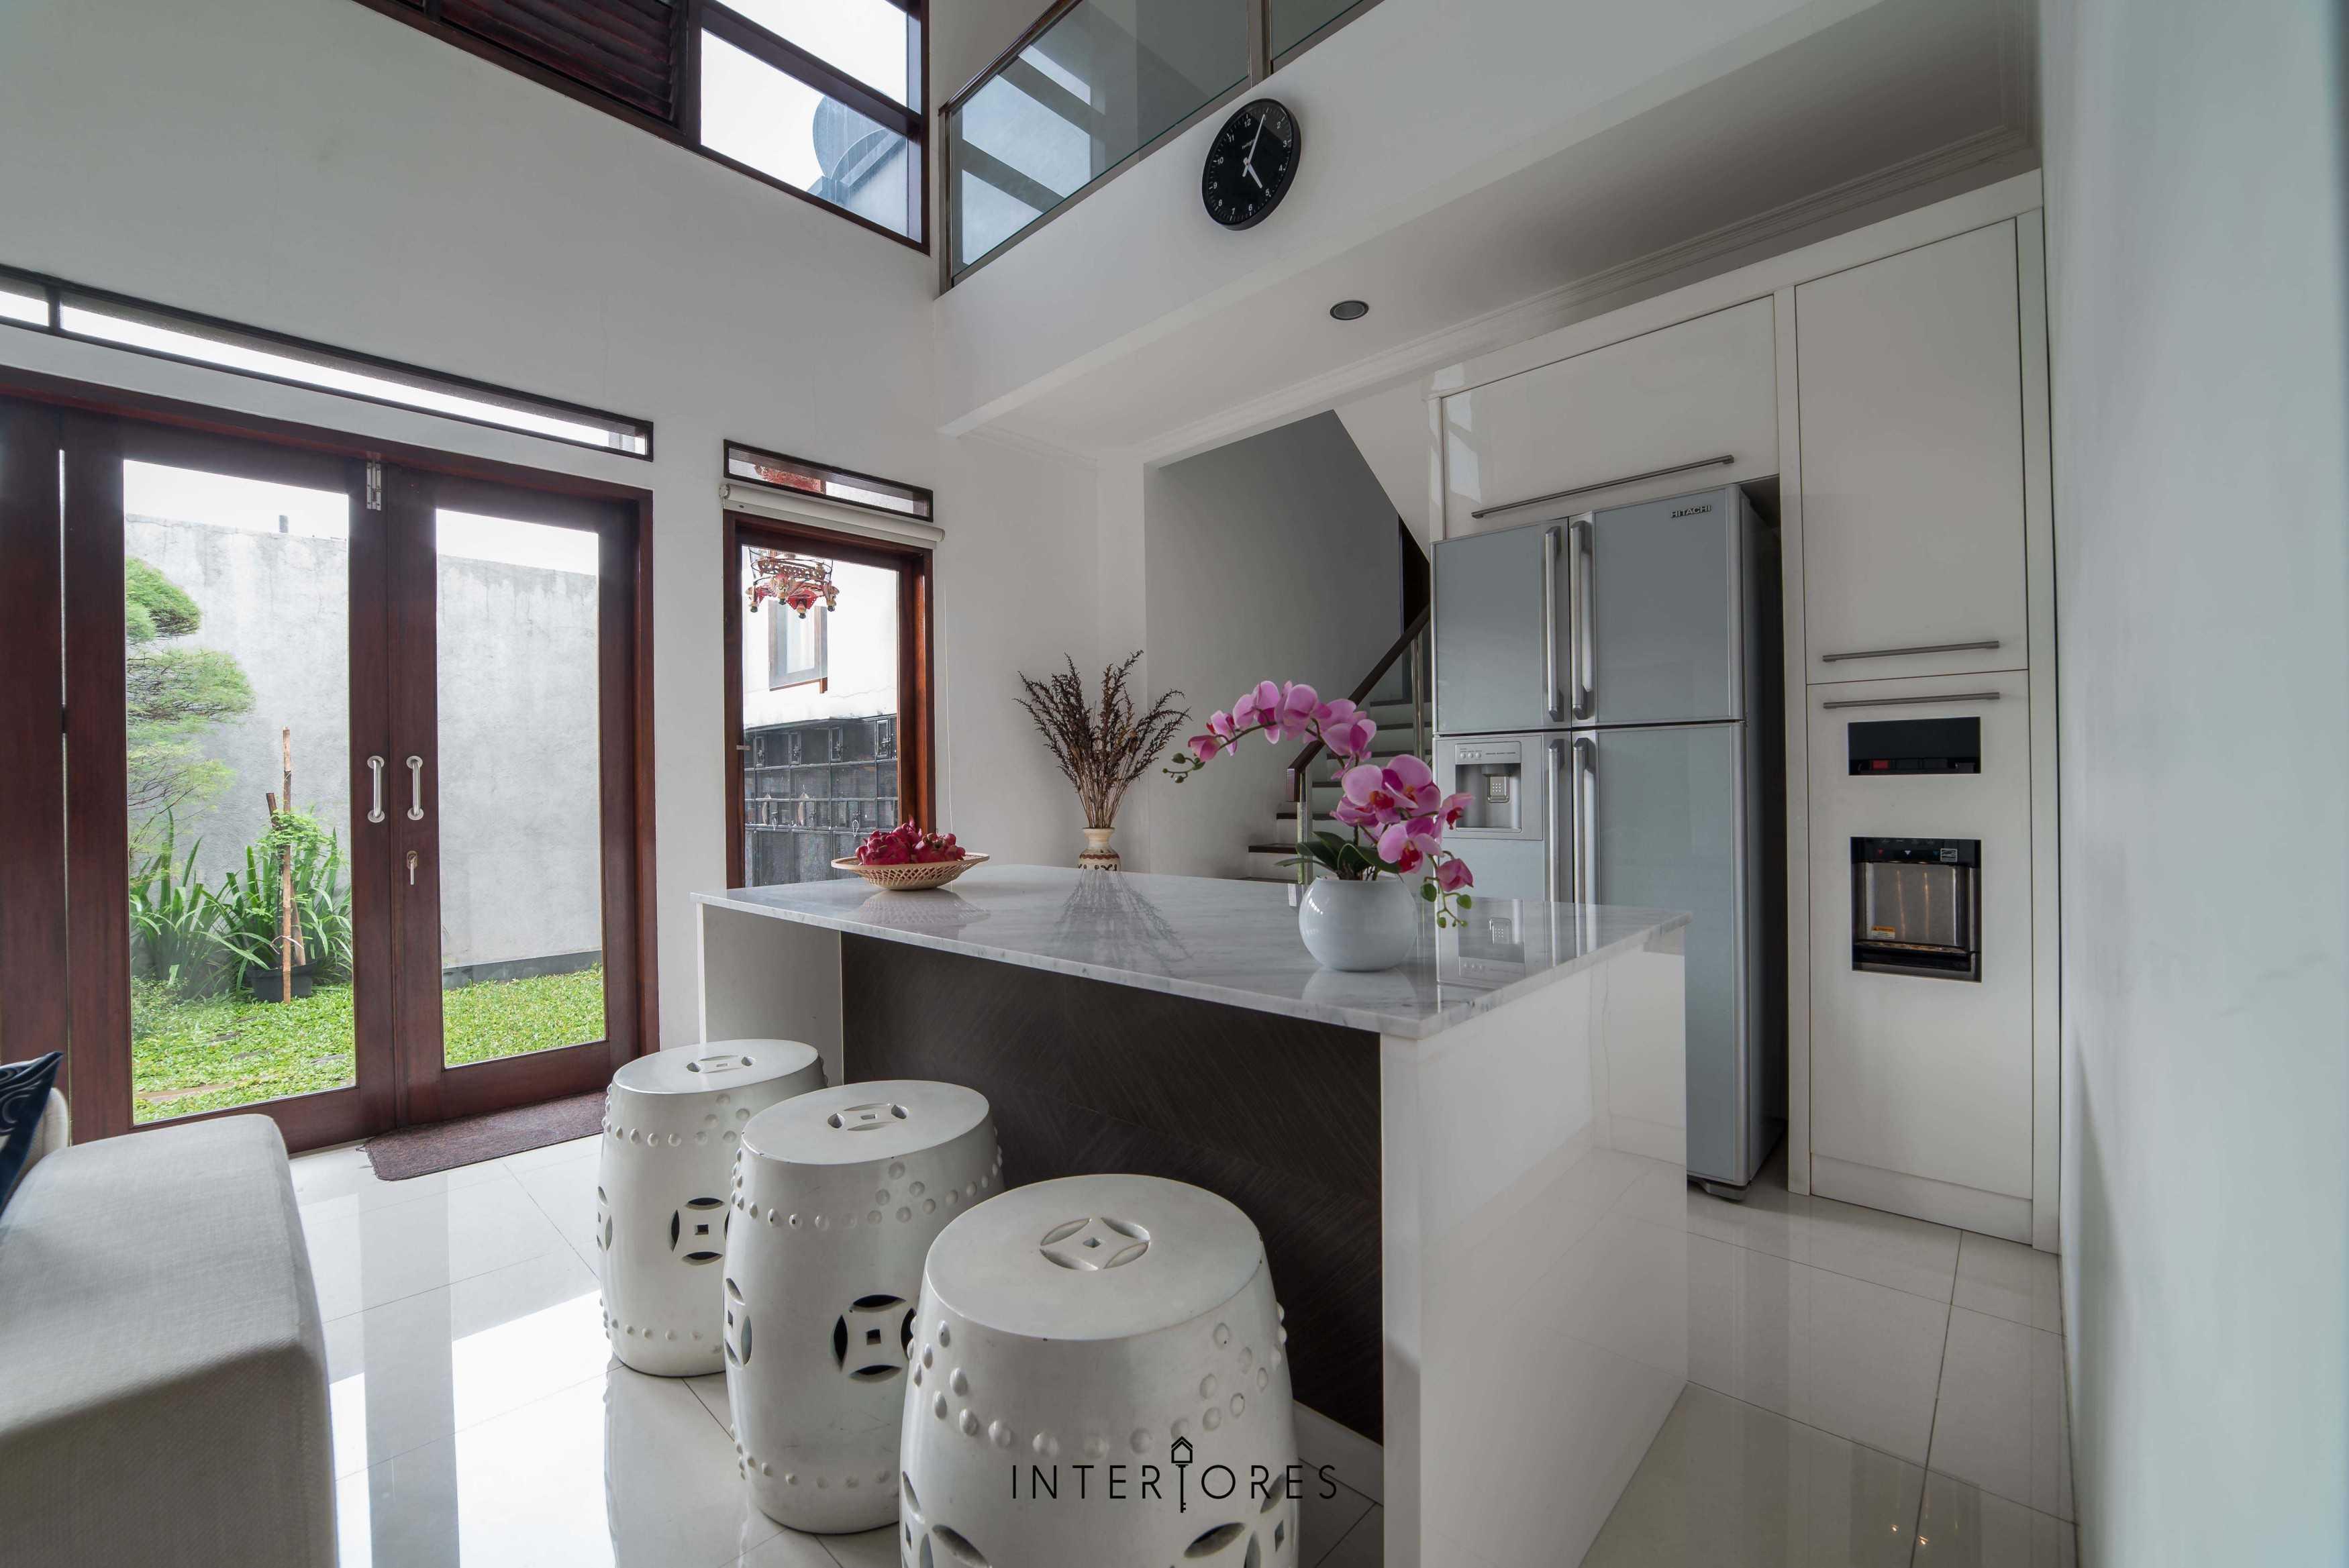 Interiores Interior Consultant & Build Greta 90 Bintaro Bintaro Diningroom Kontemporer  17684